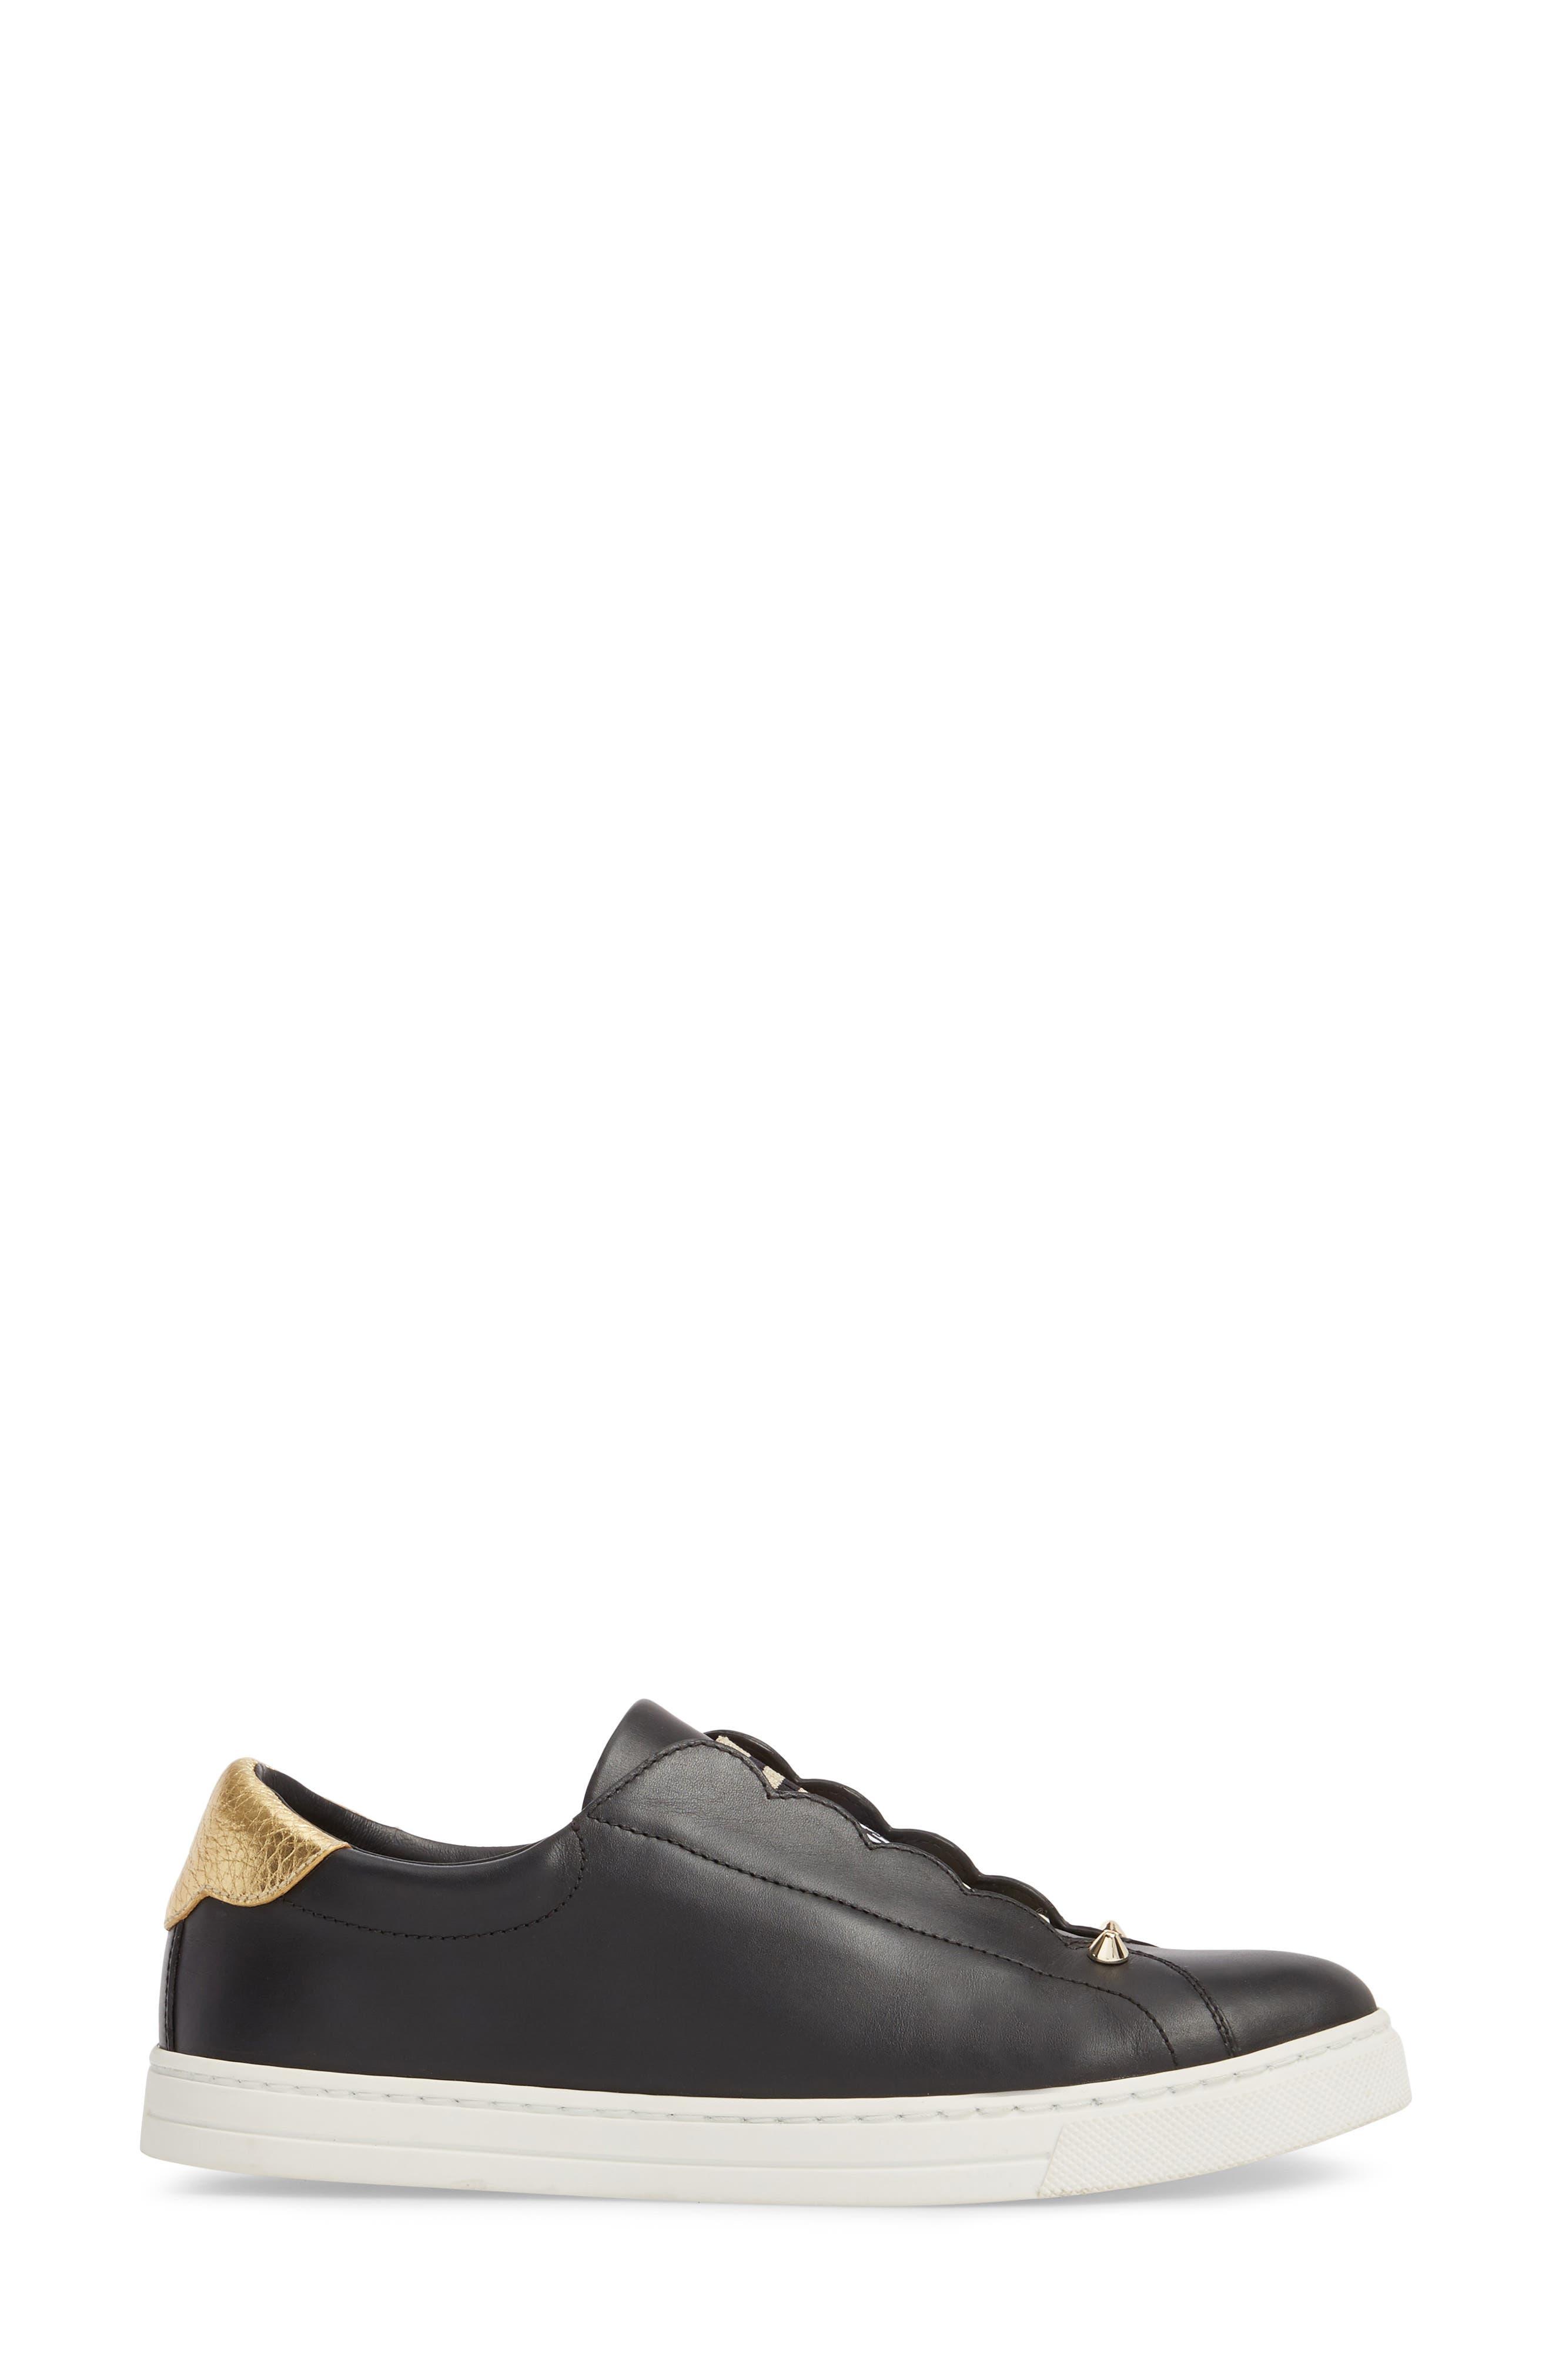 Rockono Slip-On Sneaker,                             Alternate thumbnail 3, color,                             Black